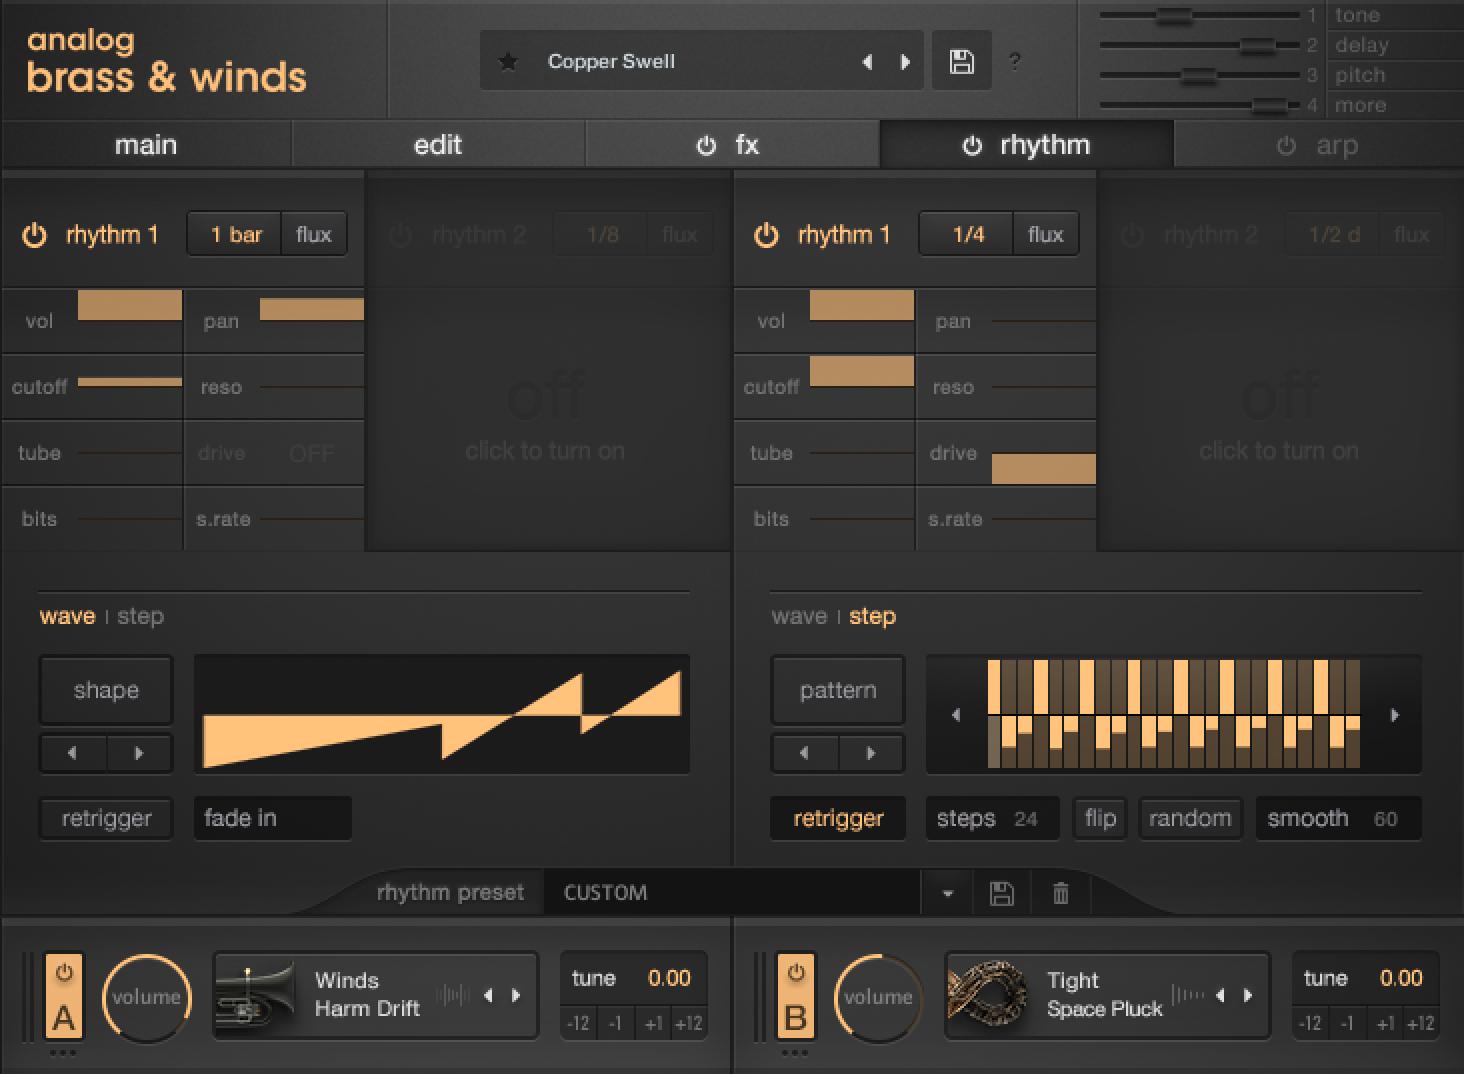 Output - Analog Brass _ Winds - GUI - 4 Rhythm-1518012775922.png